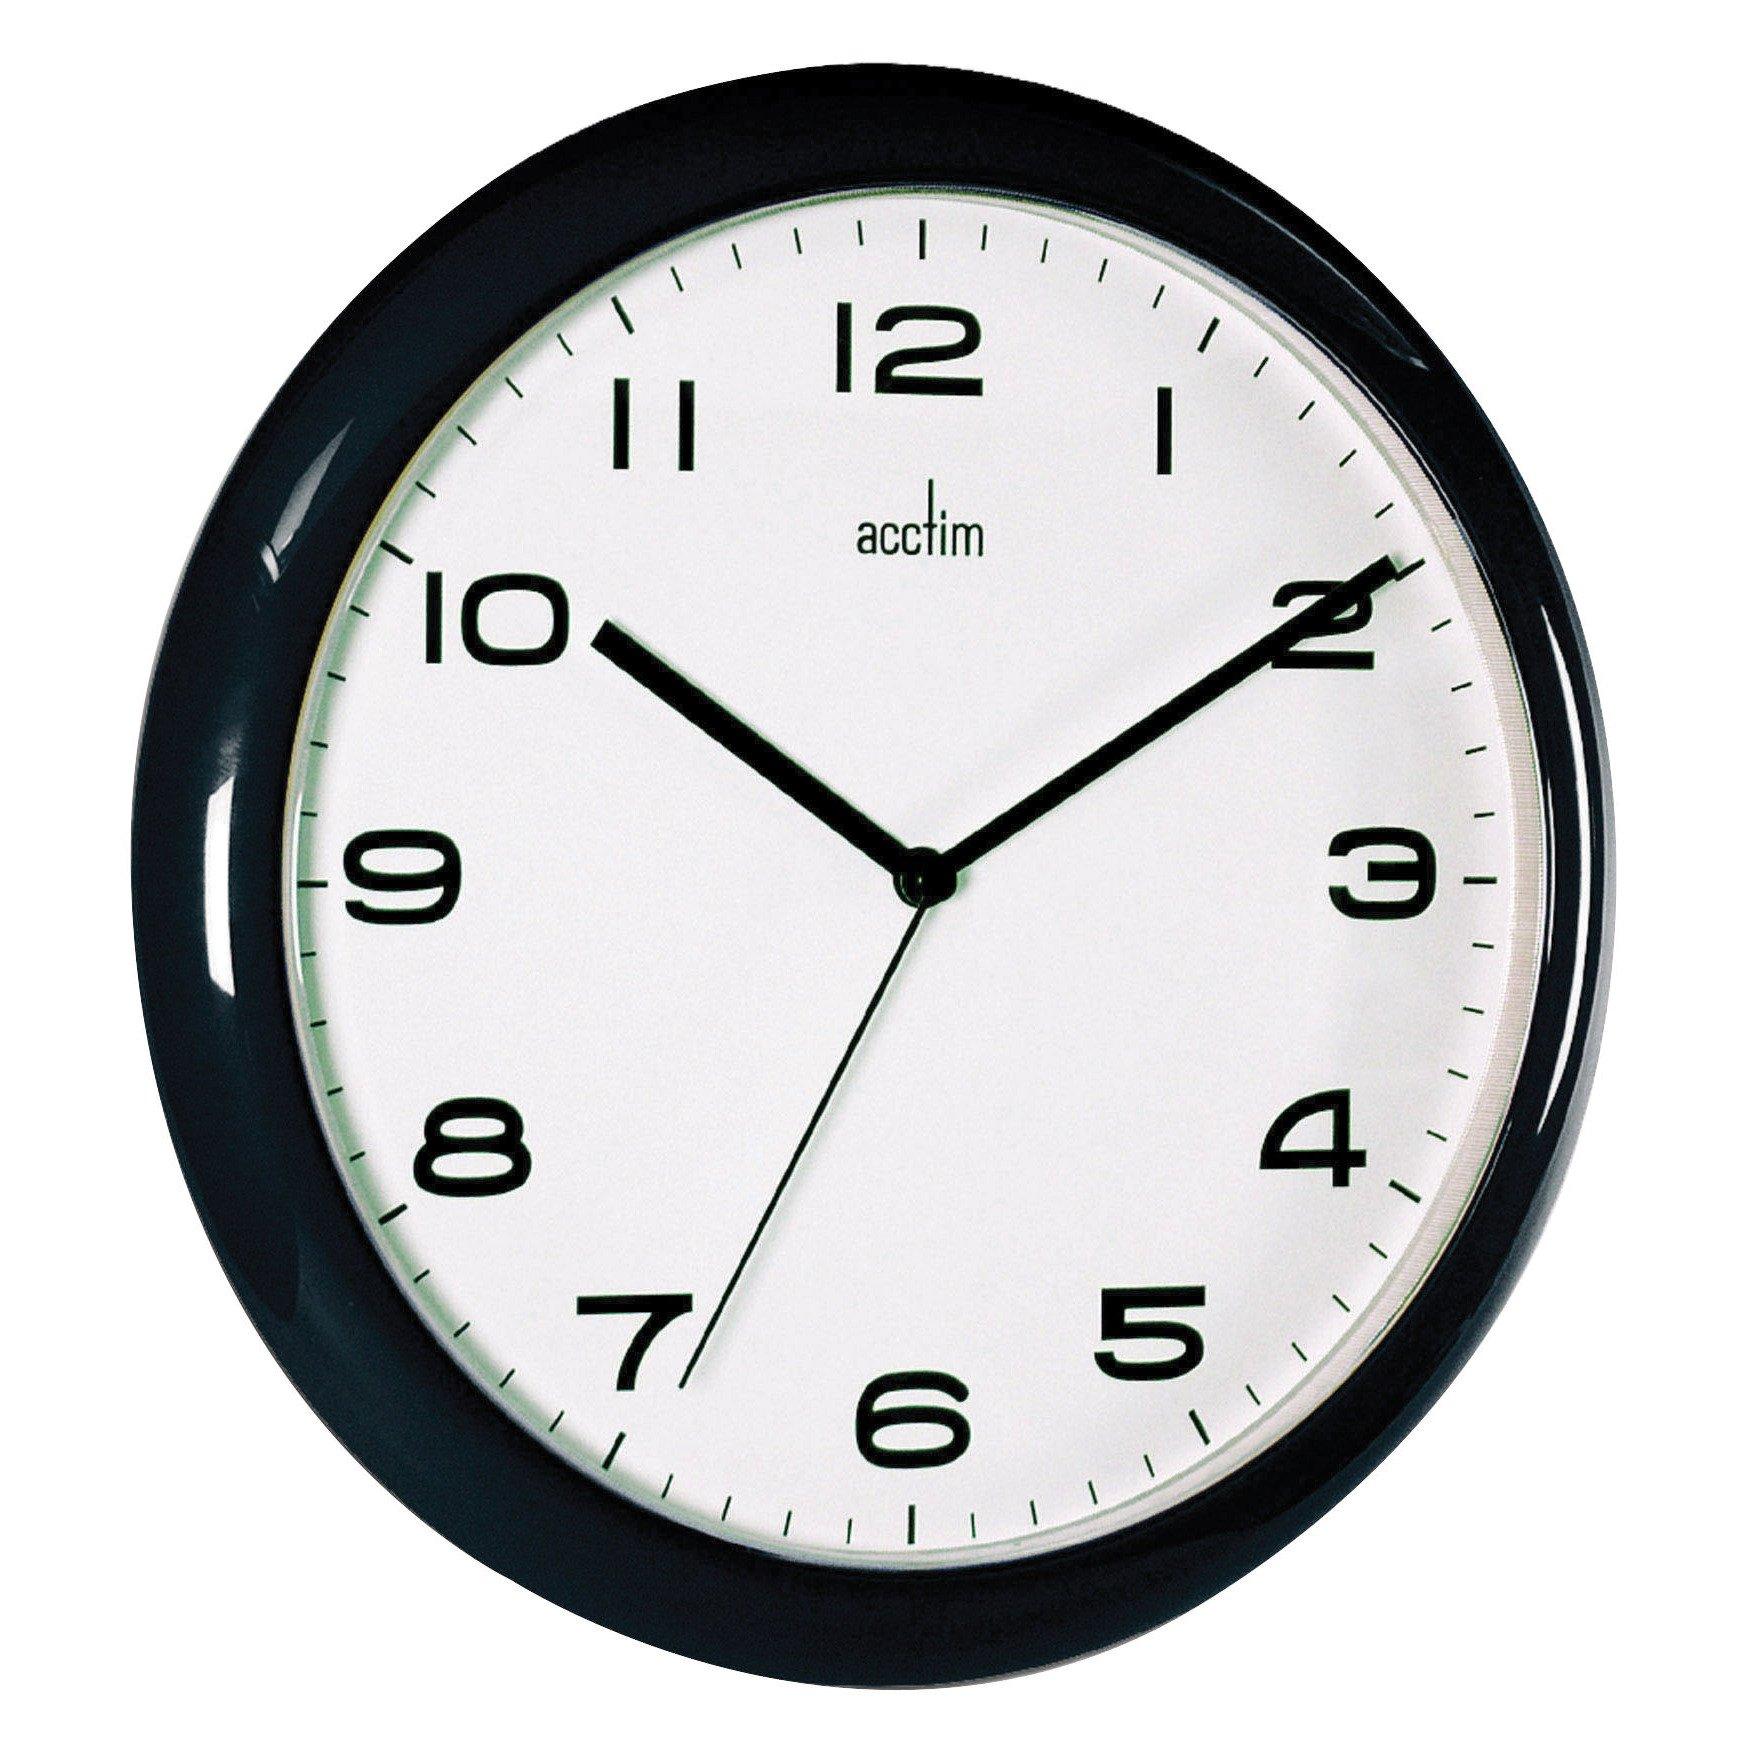 Image for Acctim Aylesbury Wall Clock Black 92/302